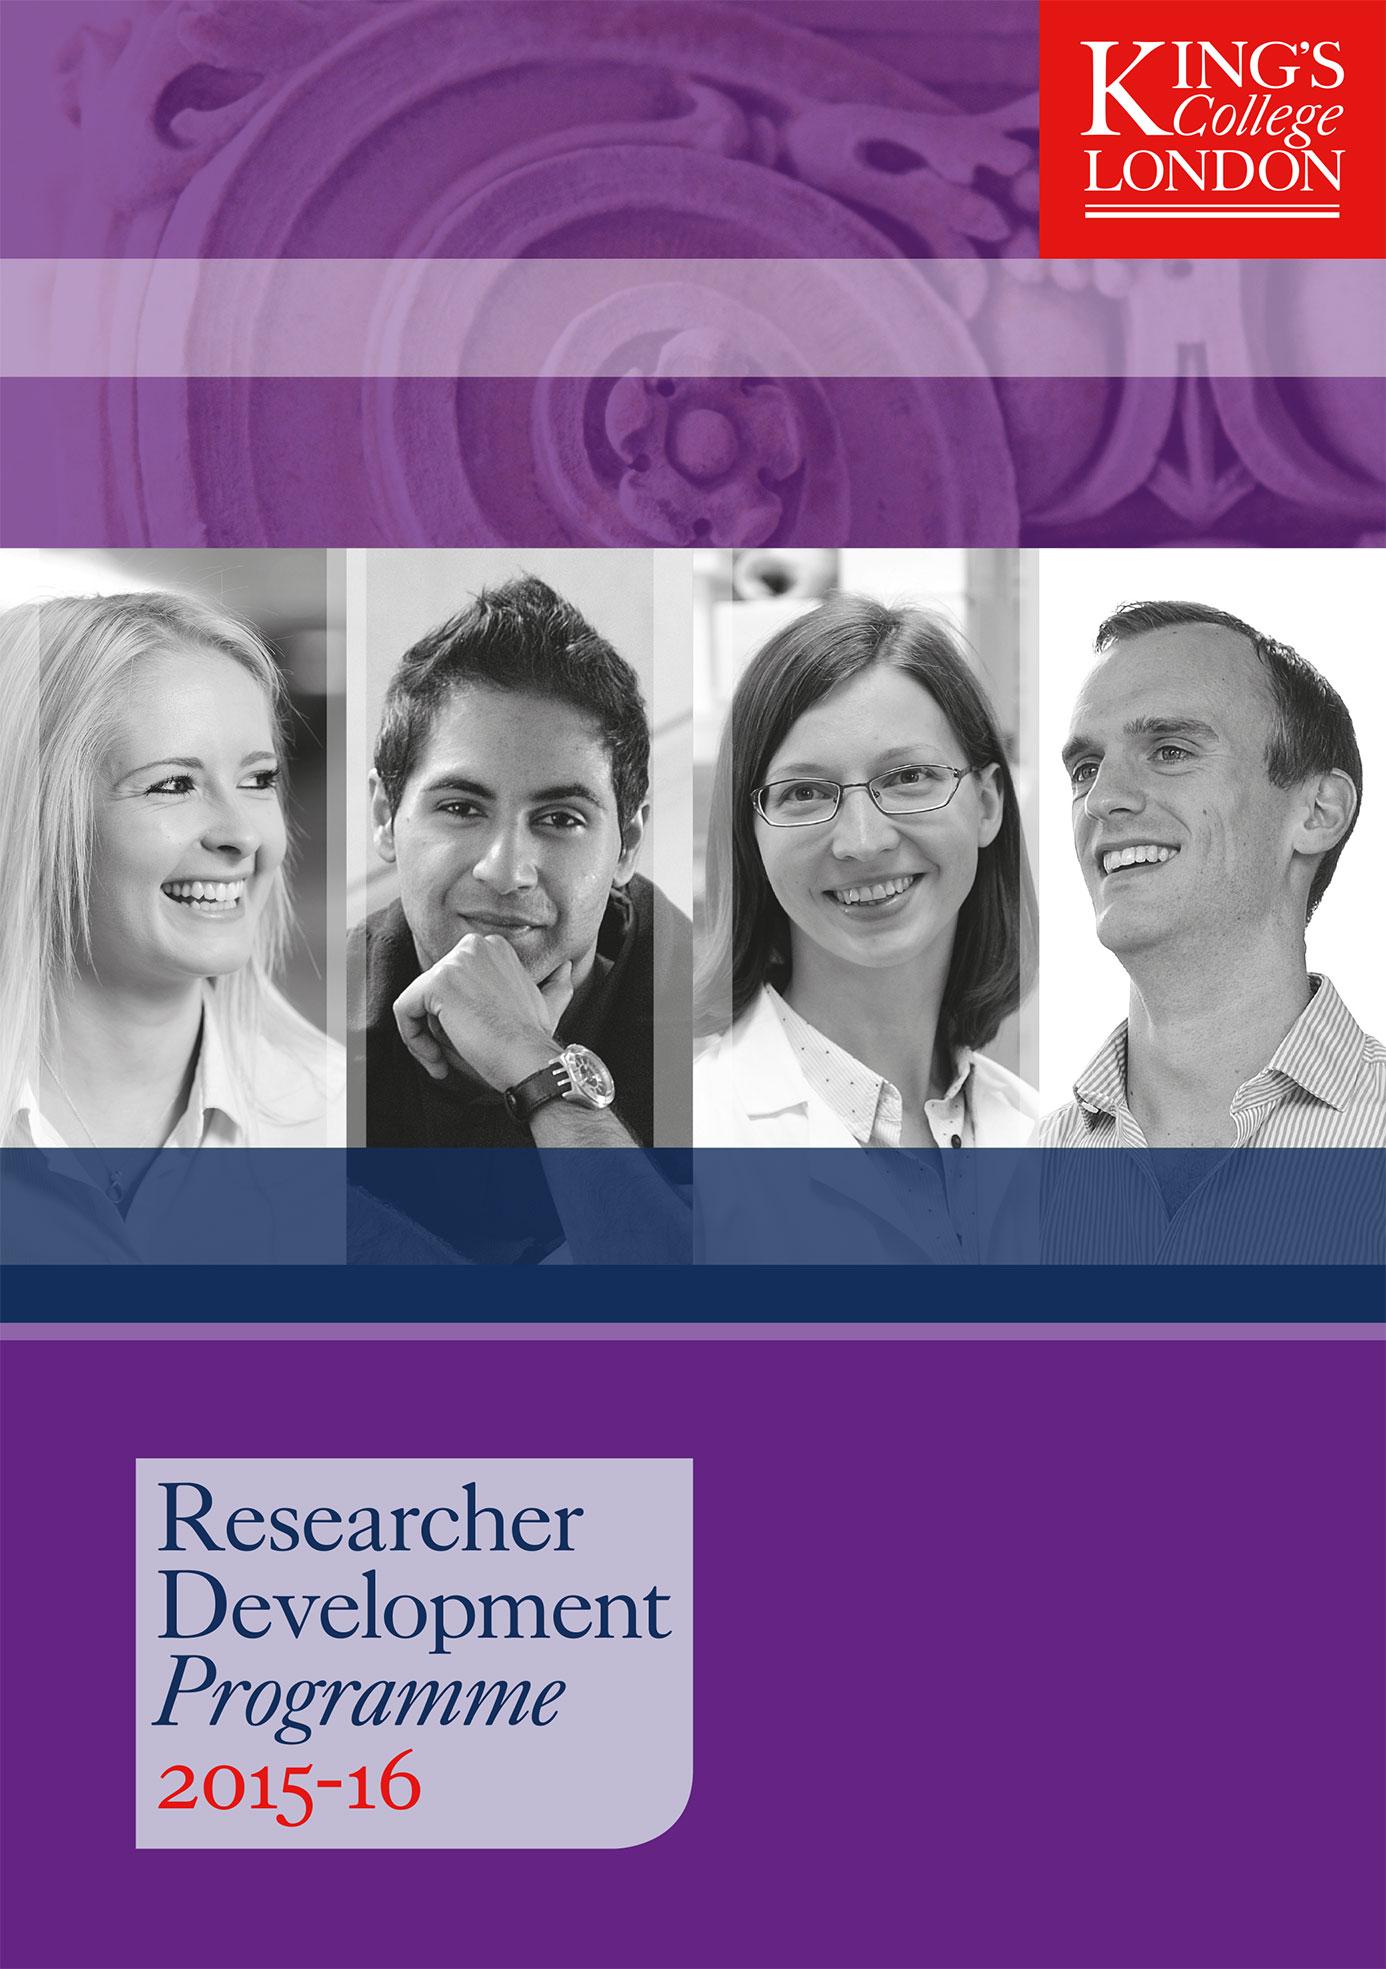 ResearcherDevelopmentProgramme_2015-16_proof4_TEXT_AmendedAW_postprint-1.jpg